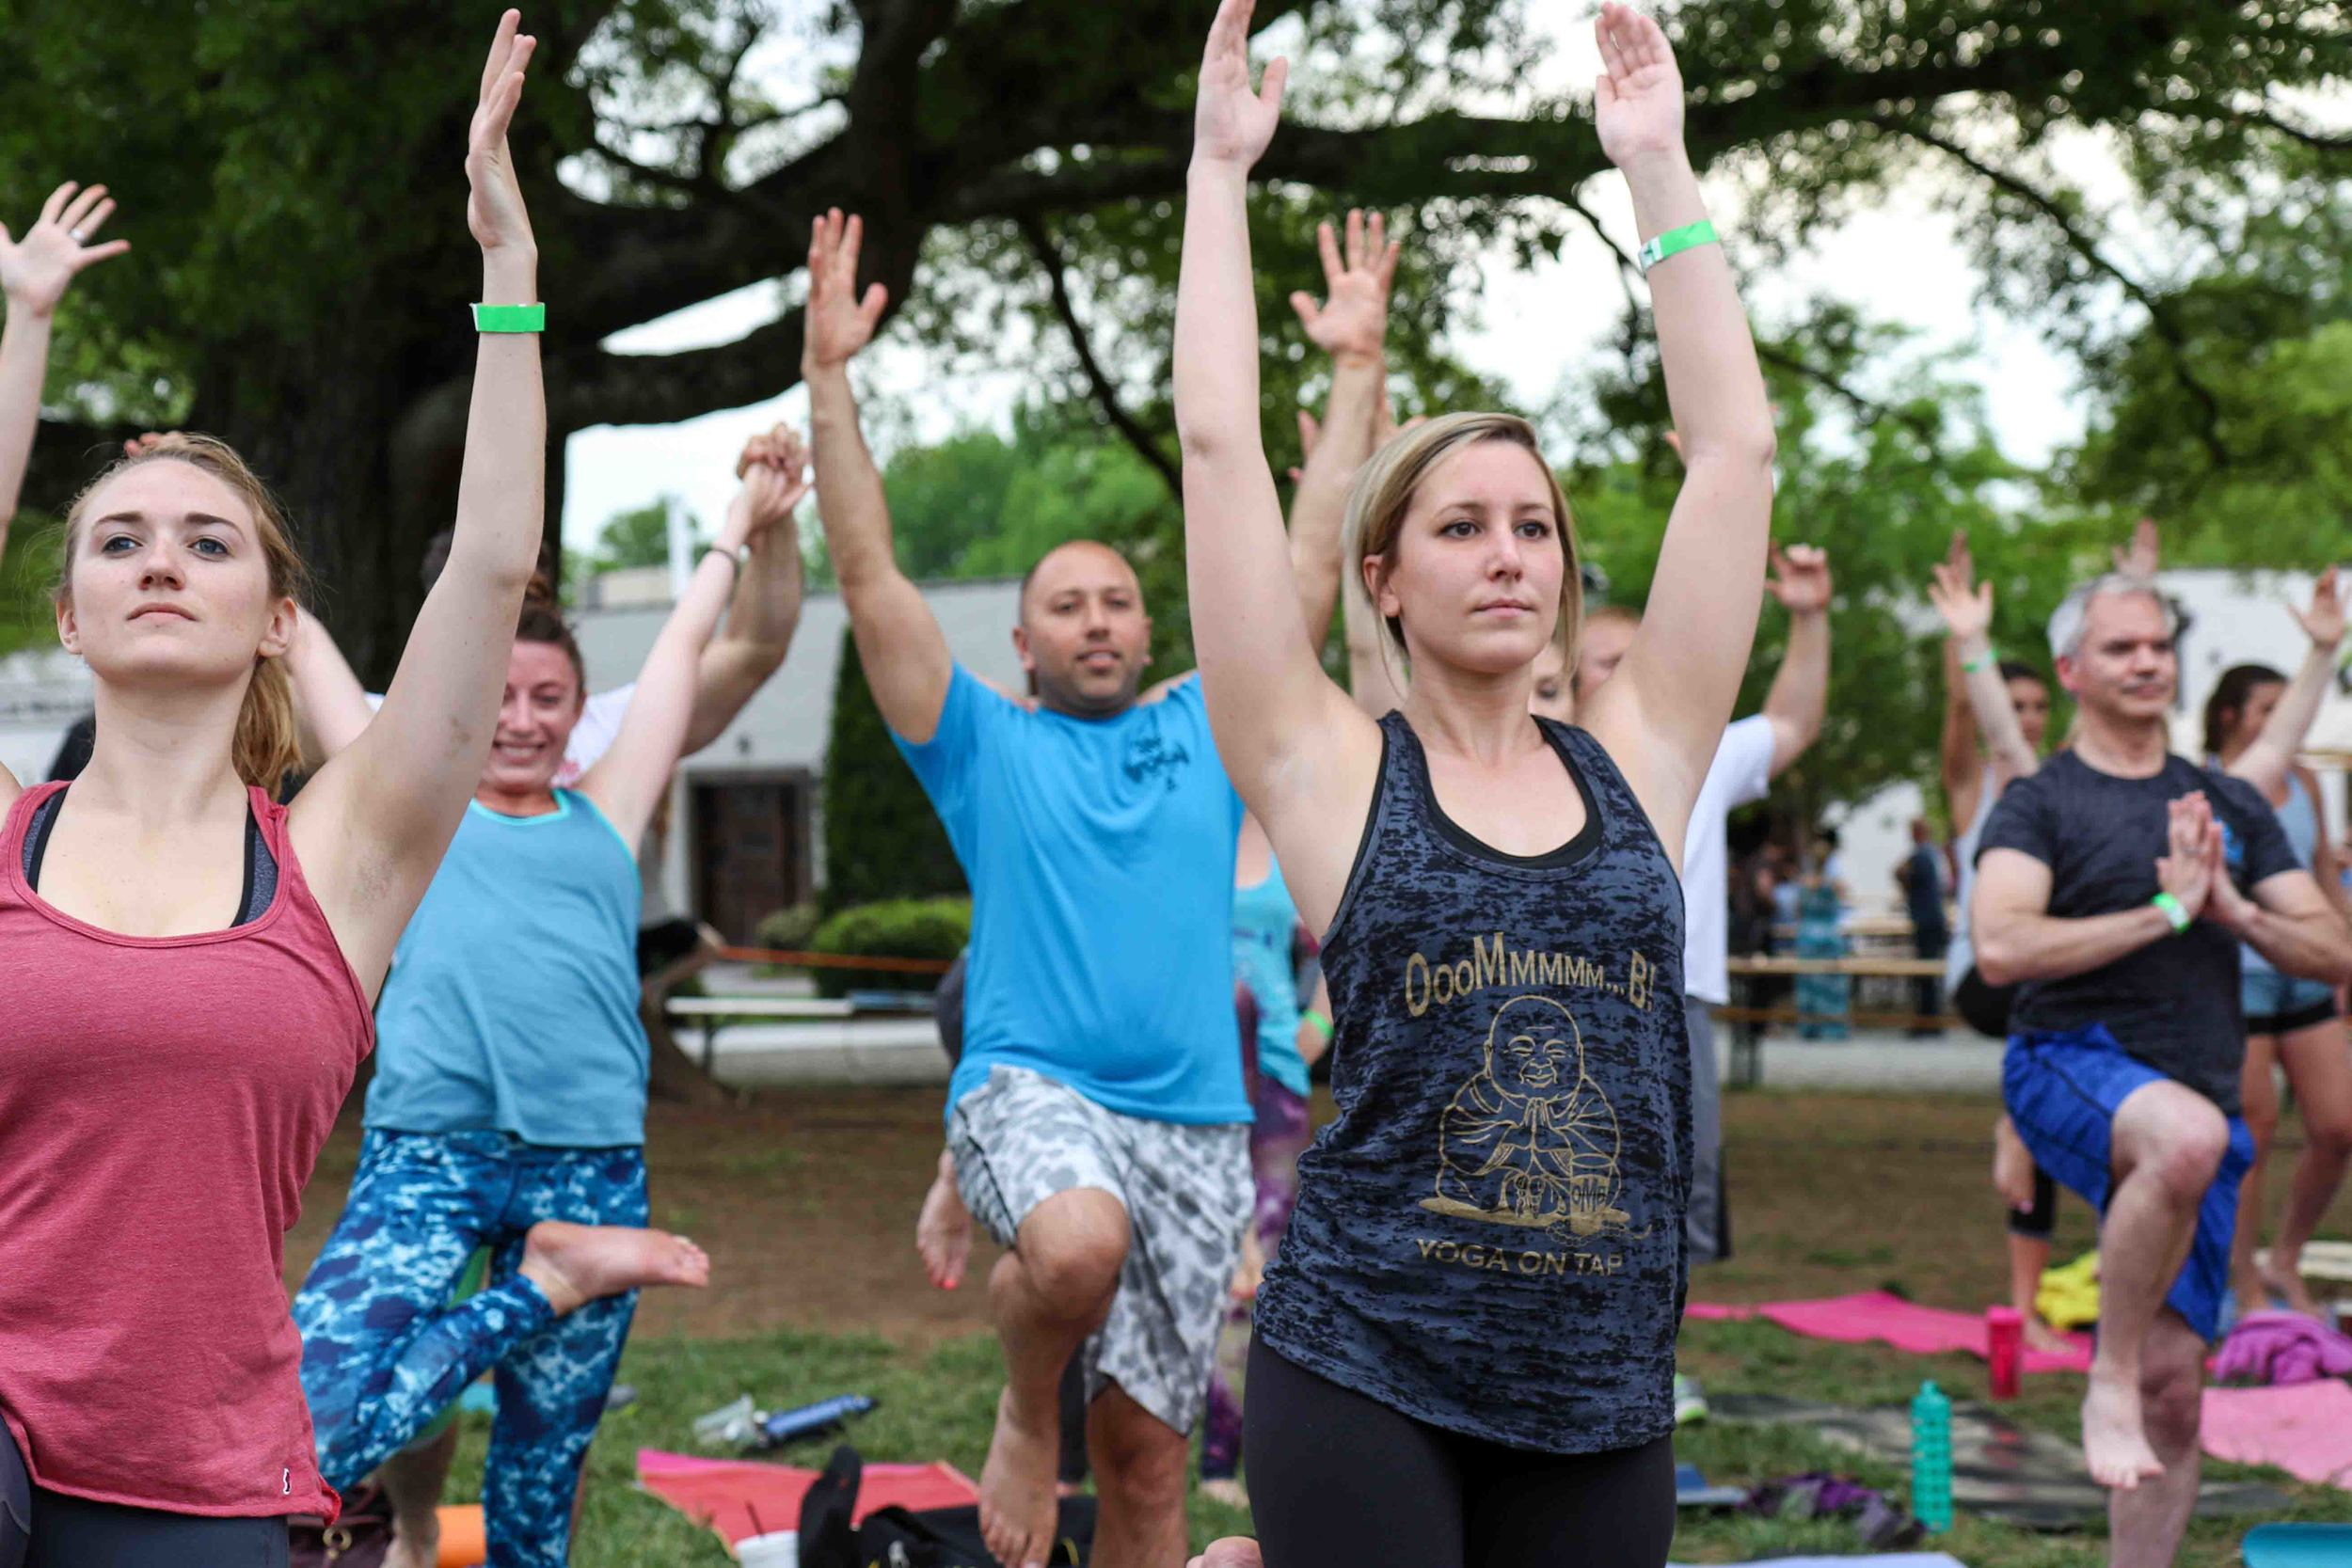 Charlotte-Yoga-On-Tap-11.JPG